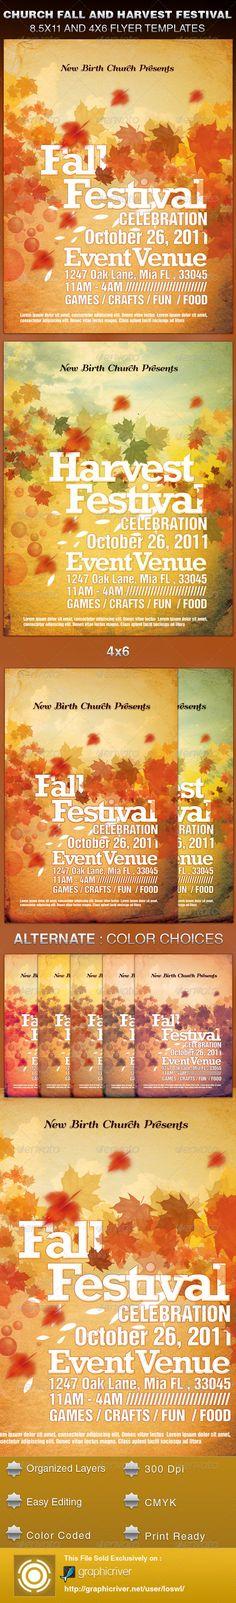 Jesus Feeds Five Thousand Church Flyer Christian Design - christian flyer templates